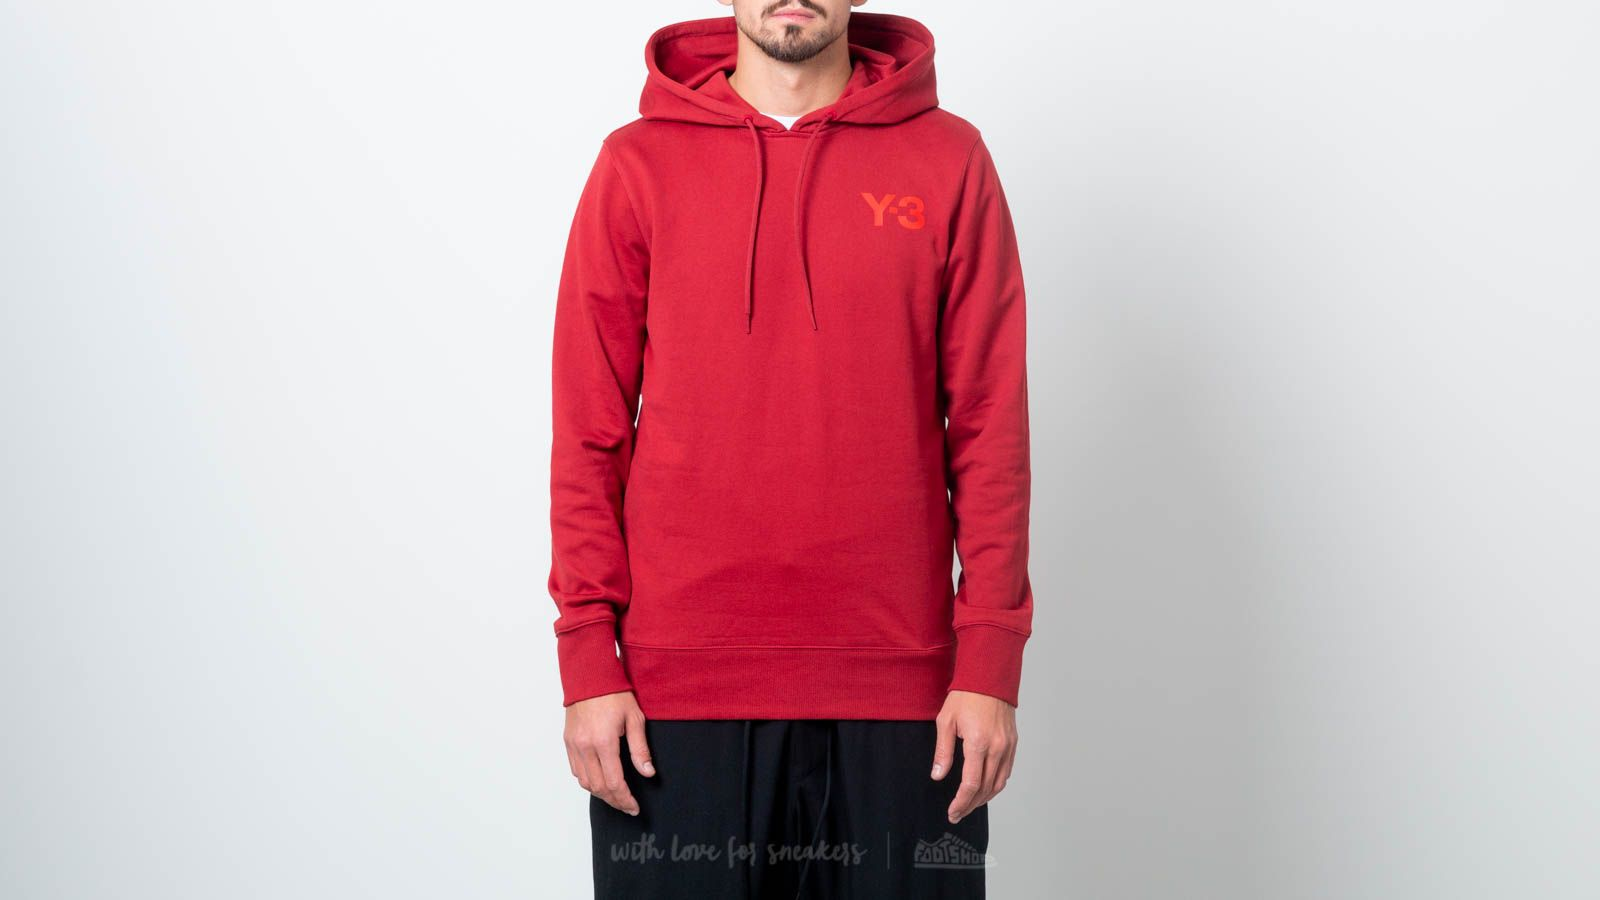 Y-3 Classic Hoodie Rus Red za skvělou cenu 4 790 Kč koupíte na Footshop.cz